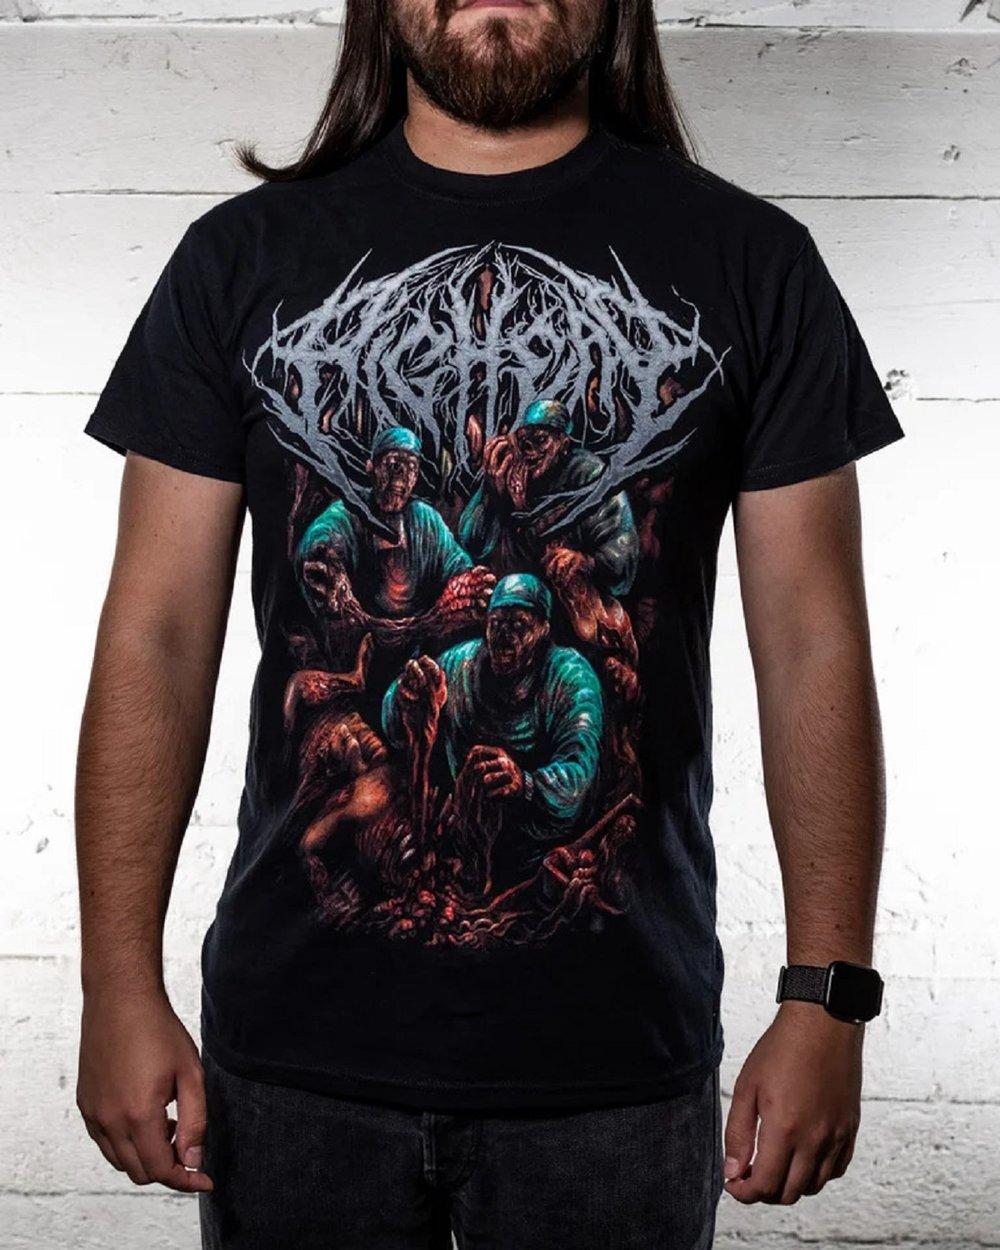 PIGHEAD - Until All Flesh Decays T-Shirt